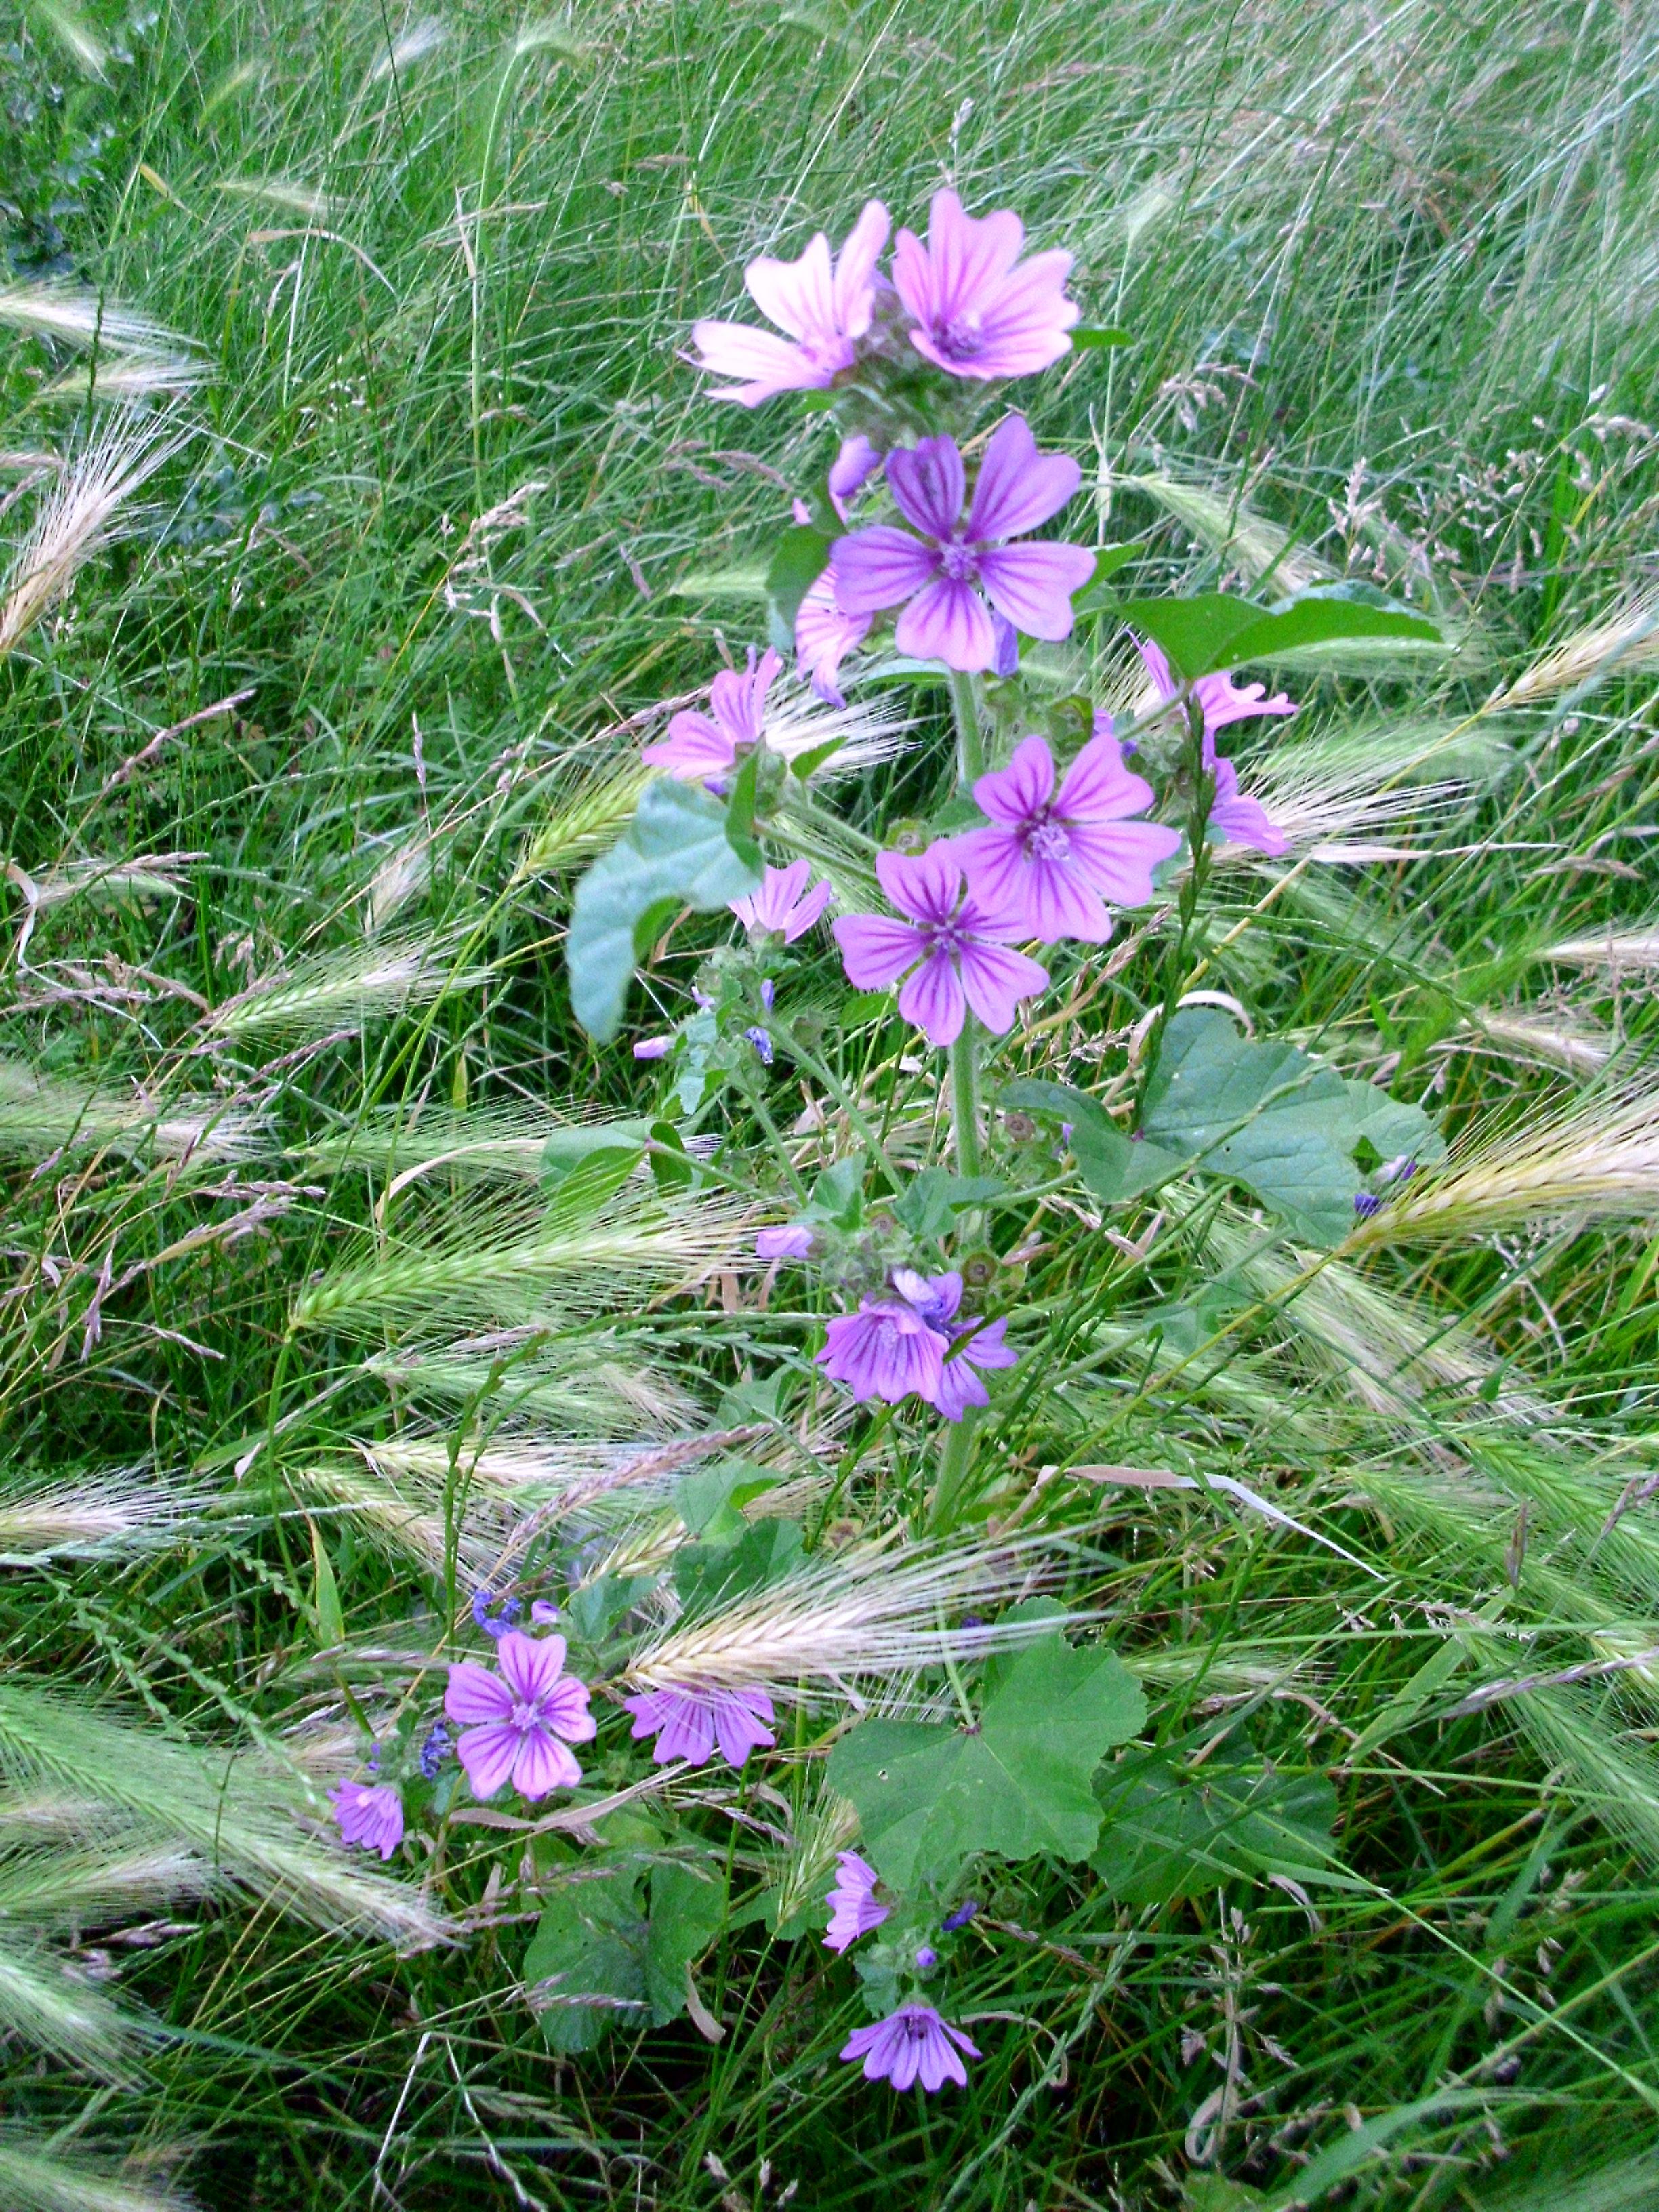 Malva Planta Wikipedia La Enciclopedia Libre